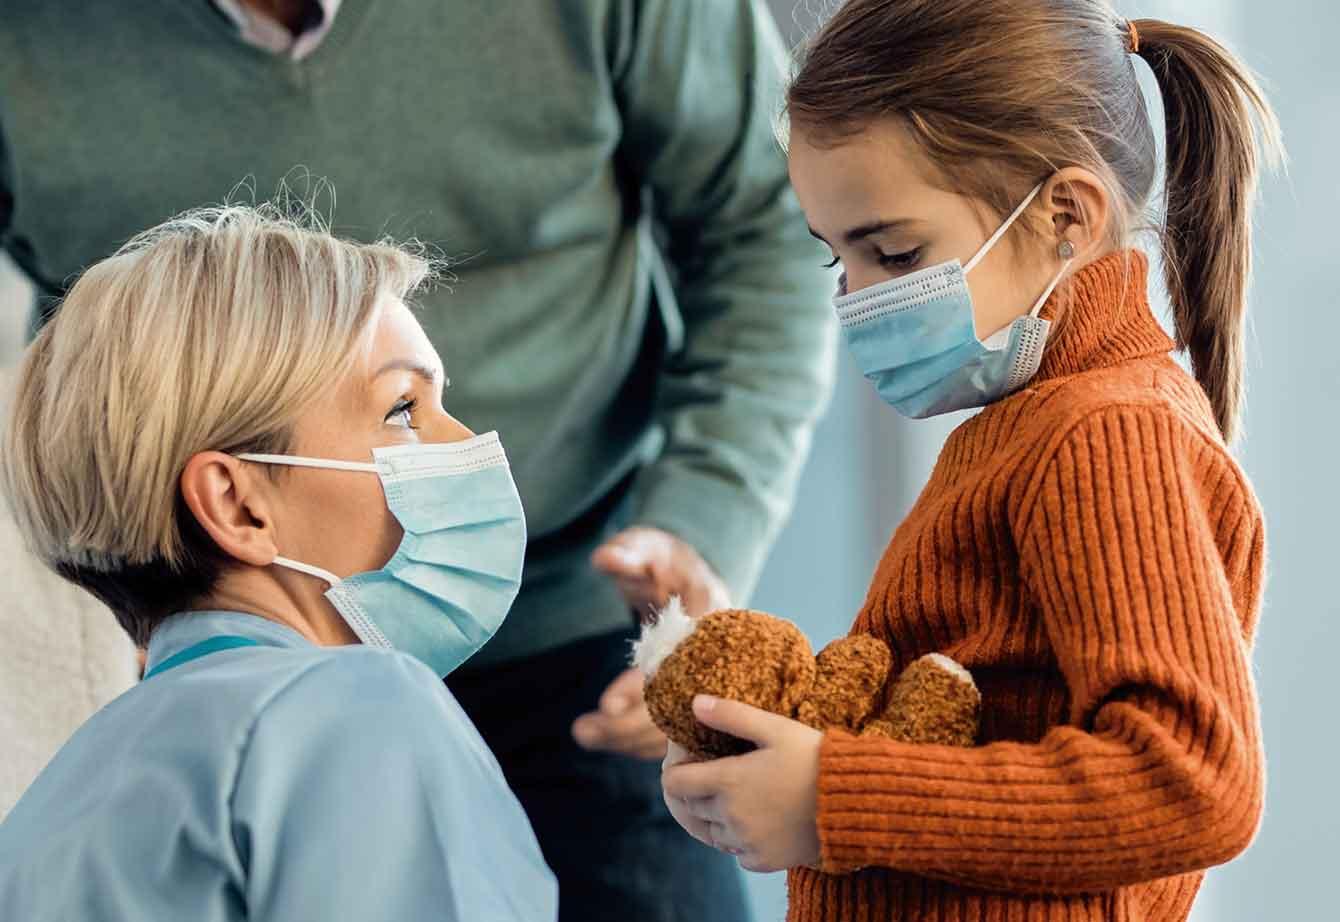 A consulta de enfermagem de Imunoalergologia